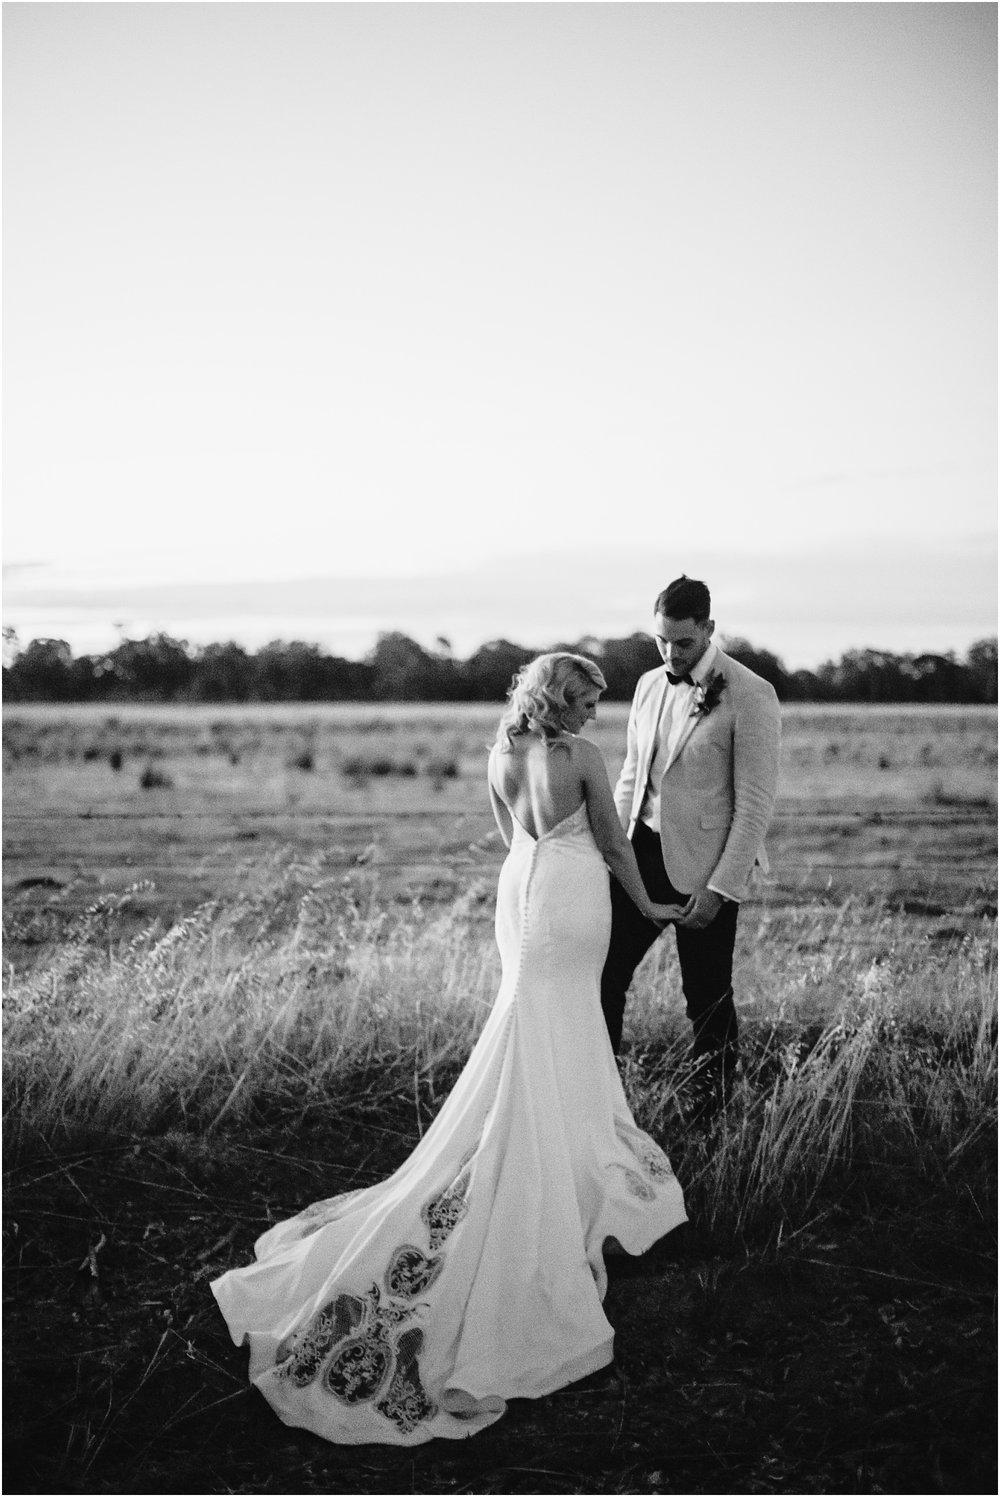 Katherine and Sam's stylish elopment at the Euroa Butter Factory._0092.jpg